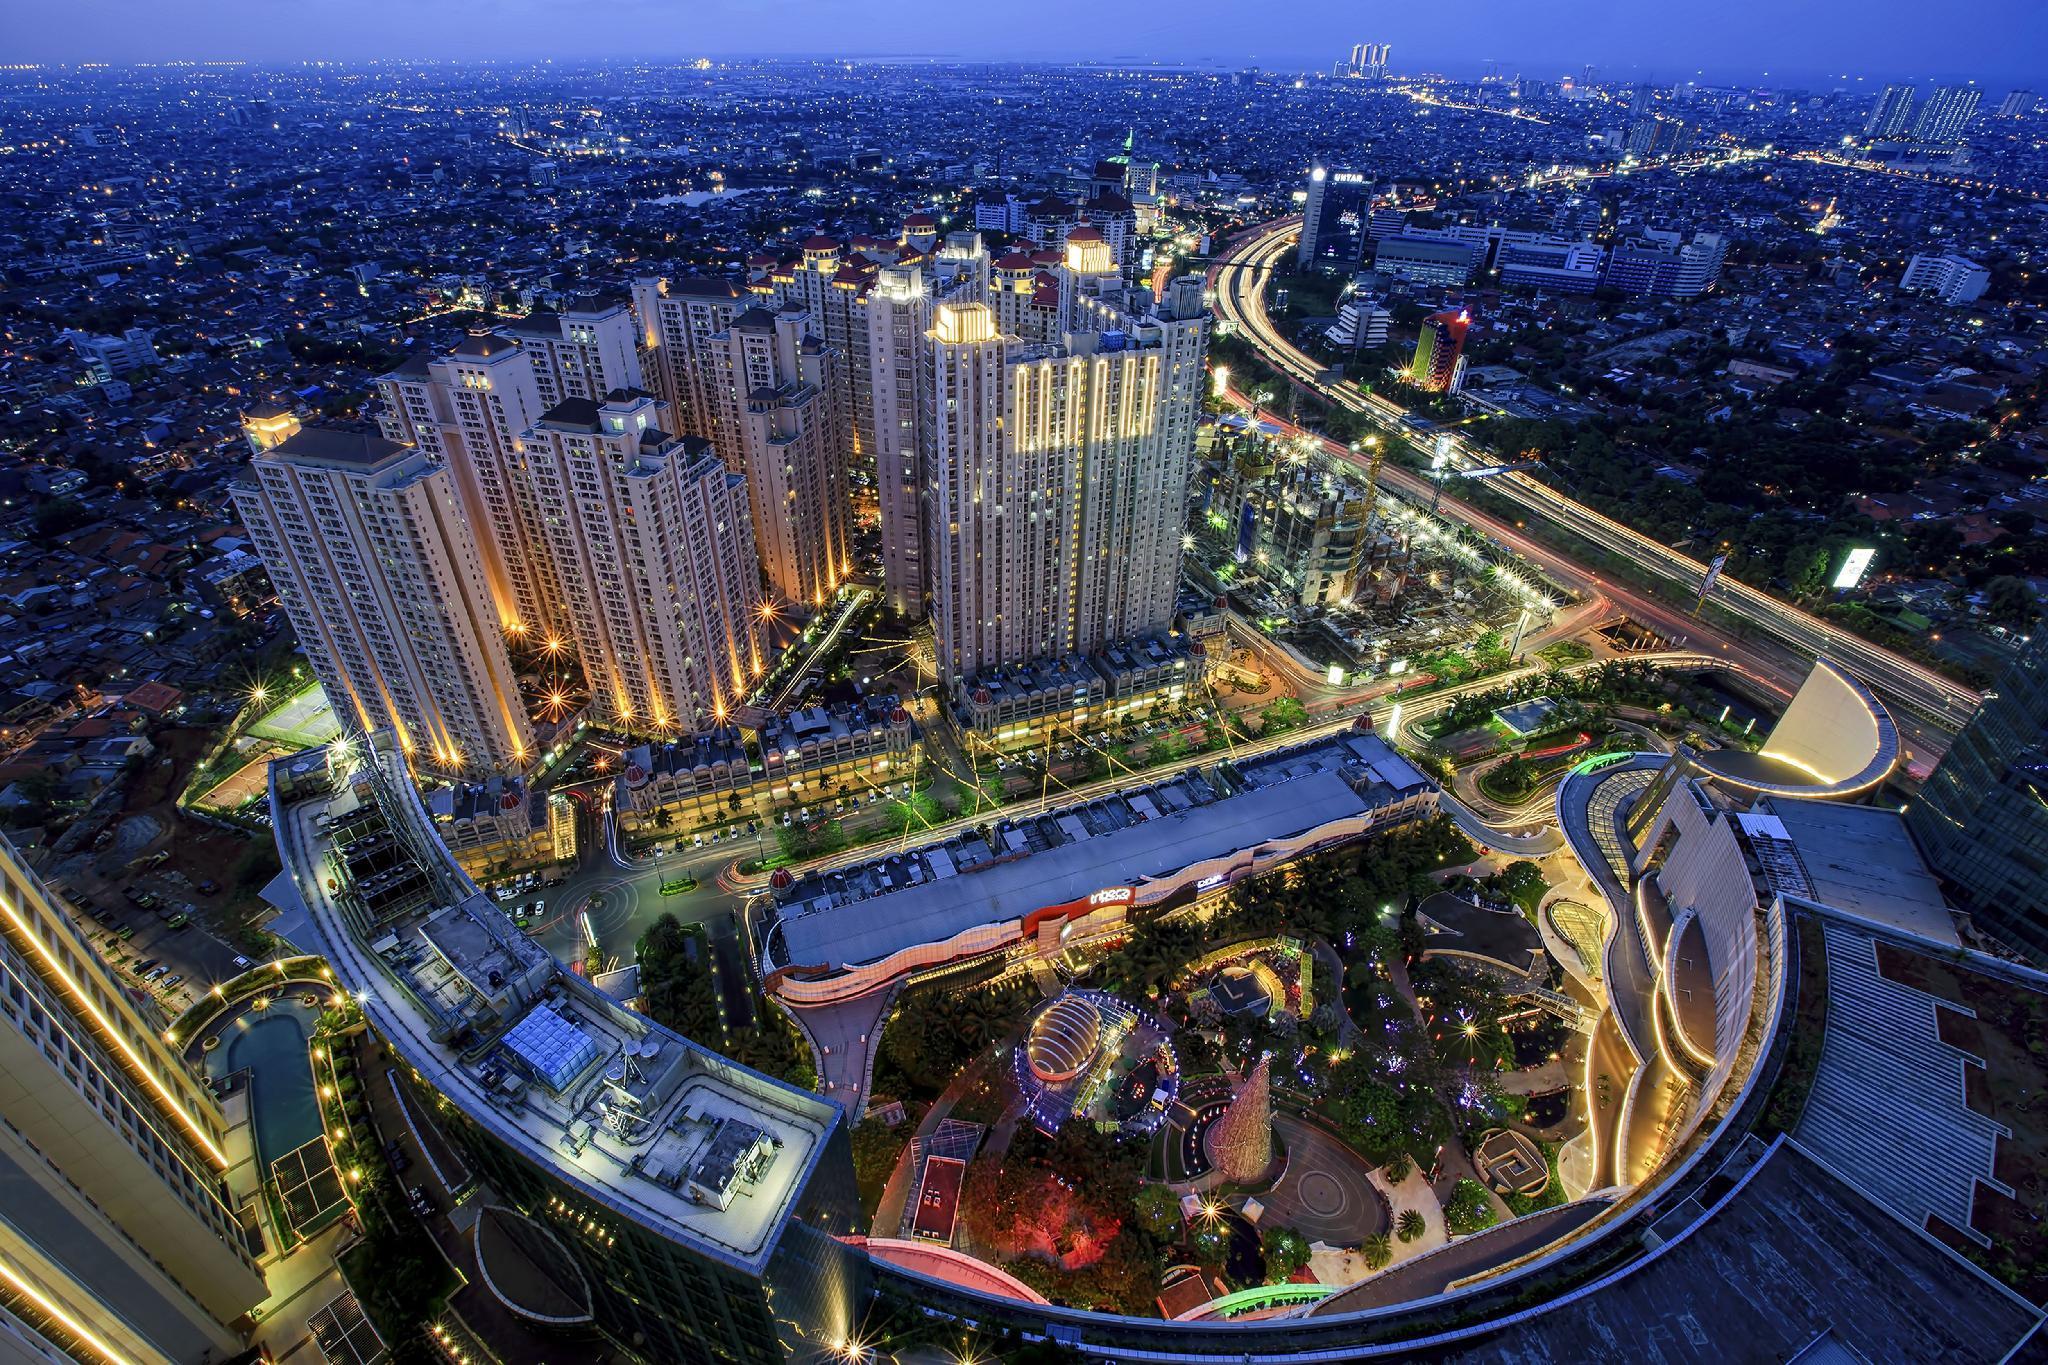 Holiday Inn Hotel and Suites Jakarta Gajah Mada, Jakarta Barat